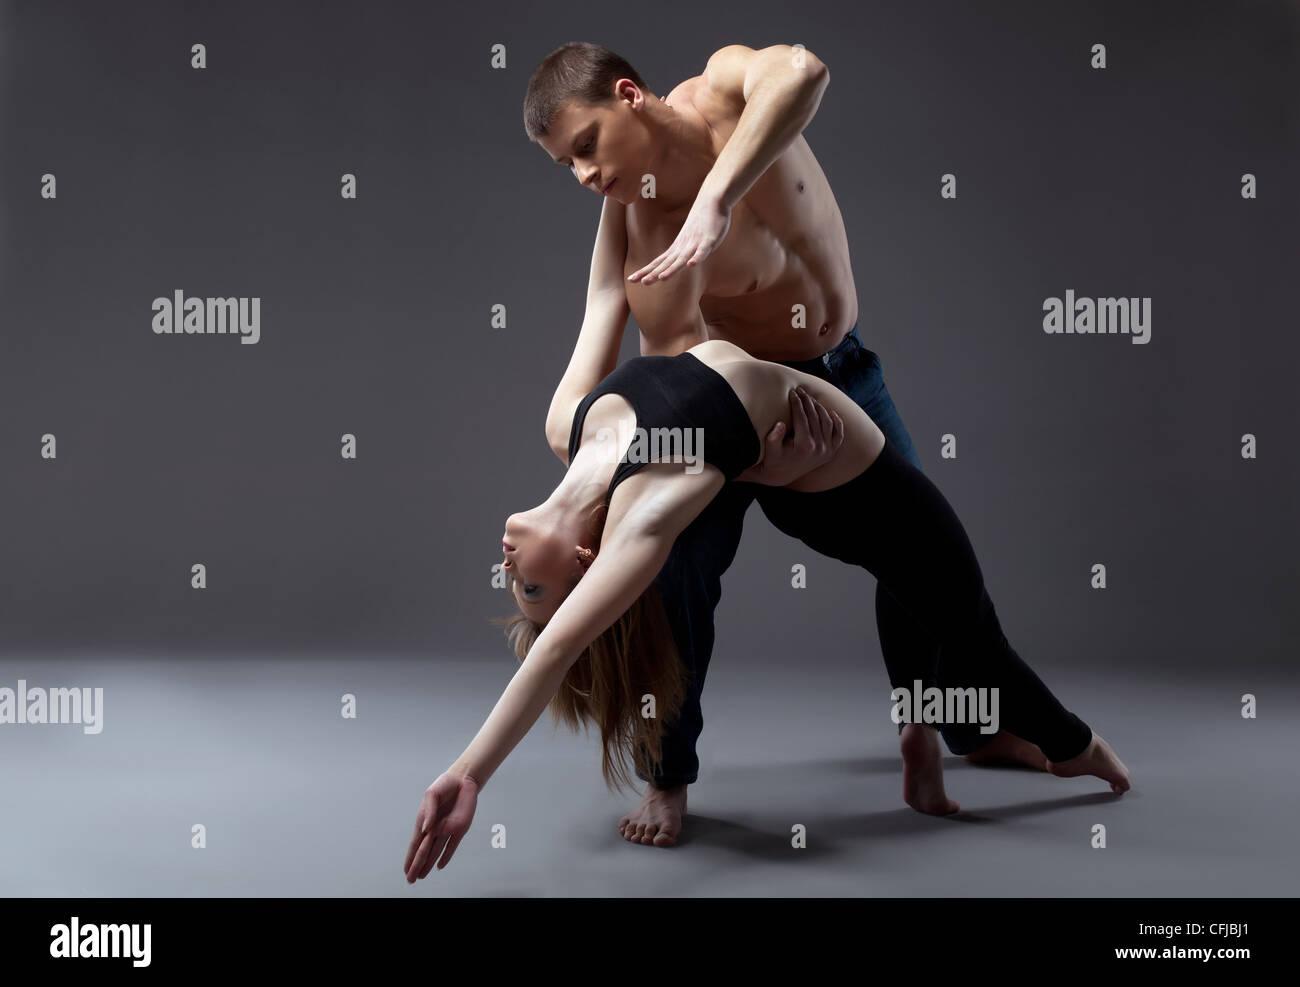 Paar junge Turnerin posiert in Tanz-Performance, isoliert Stockbild